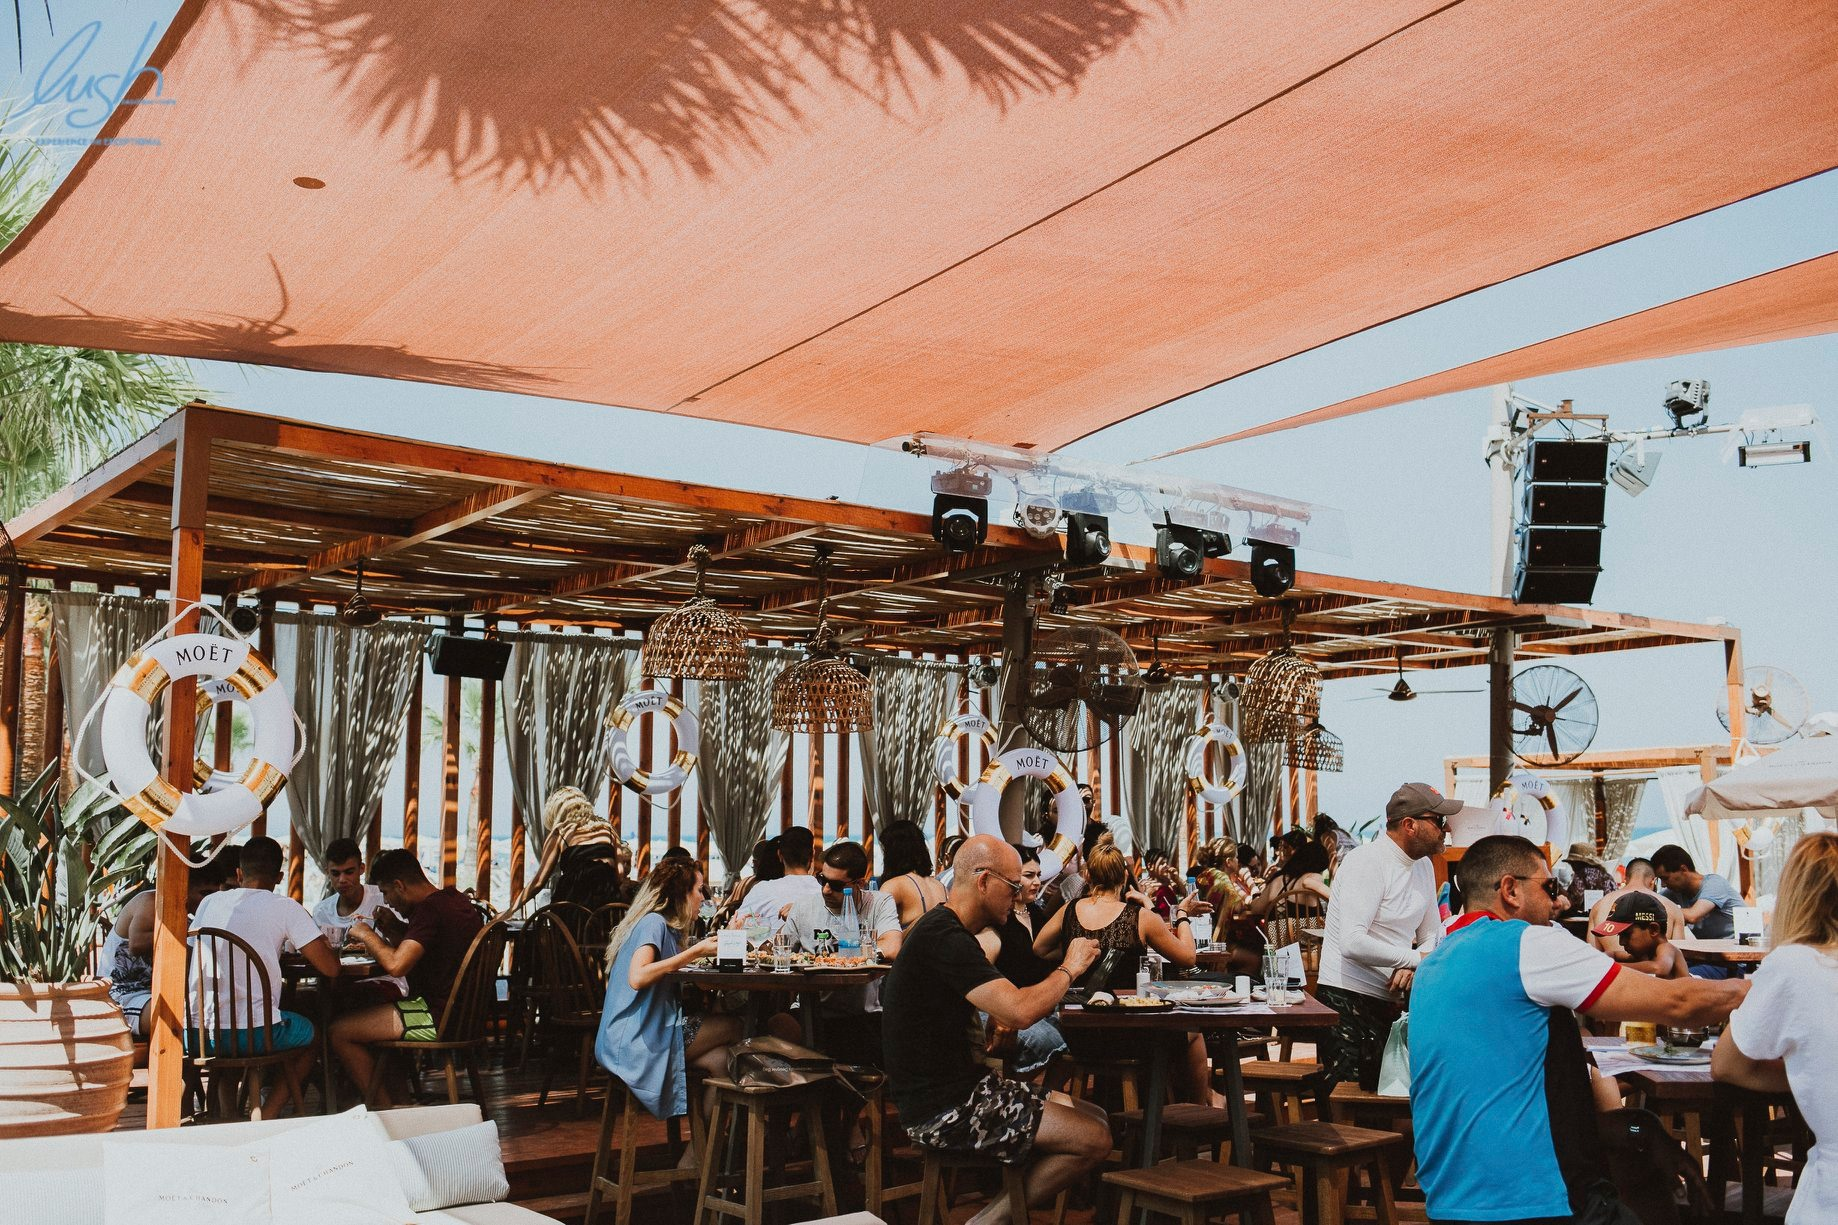 4 beach bars στη Λάρνακα για όλες τις ώρες!